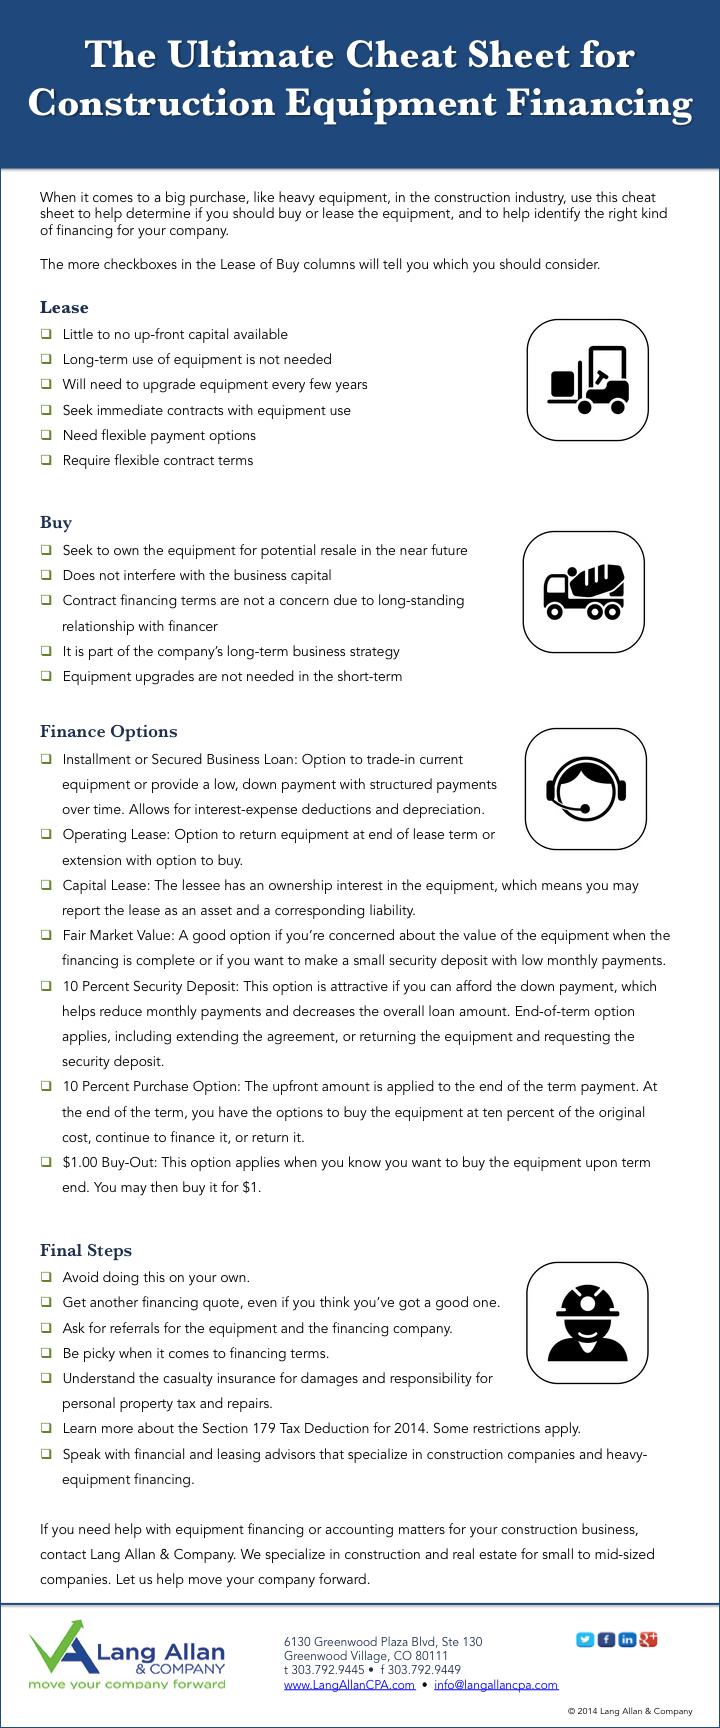 Equipment Financing Infographic